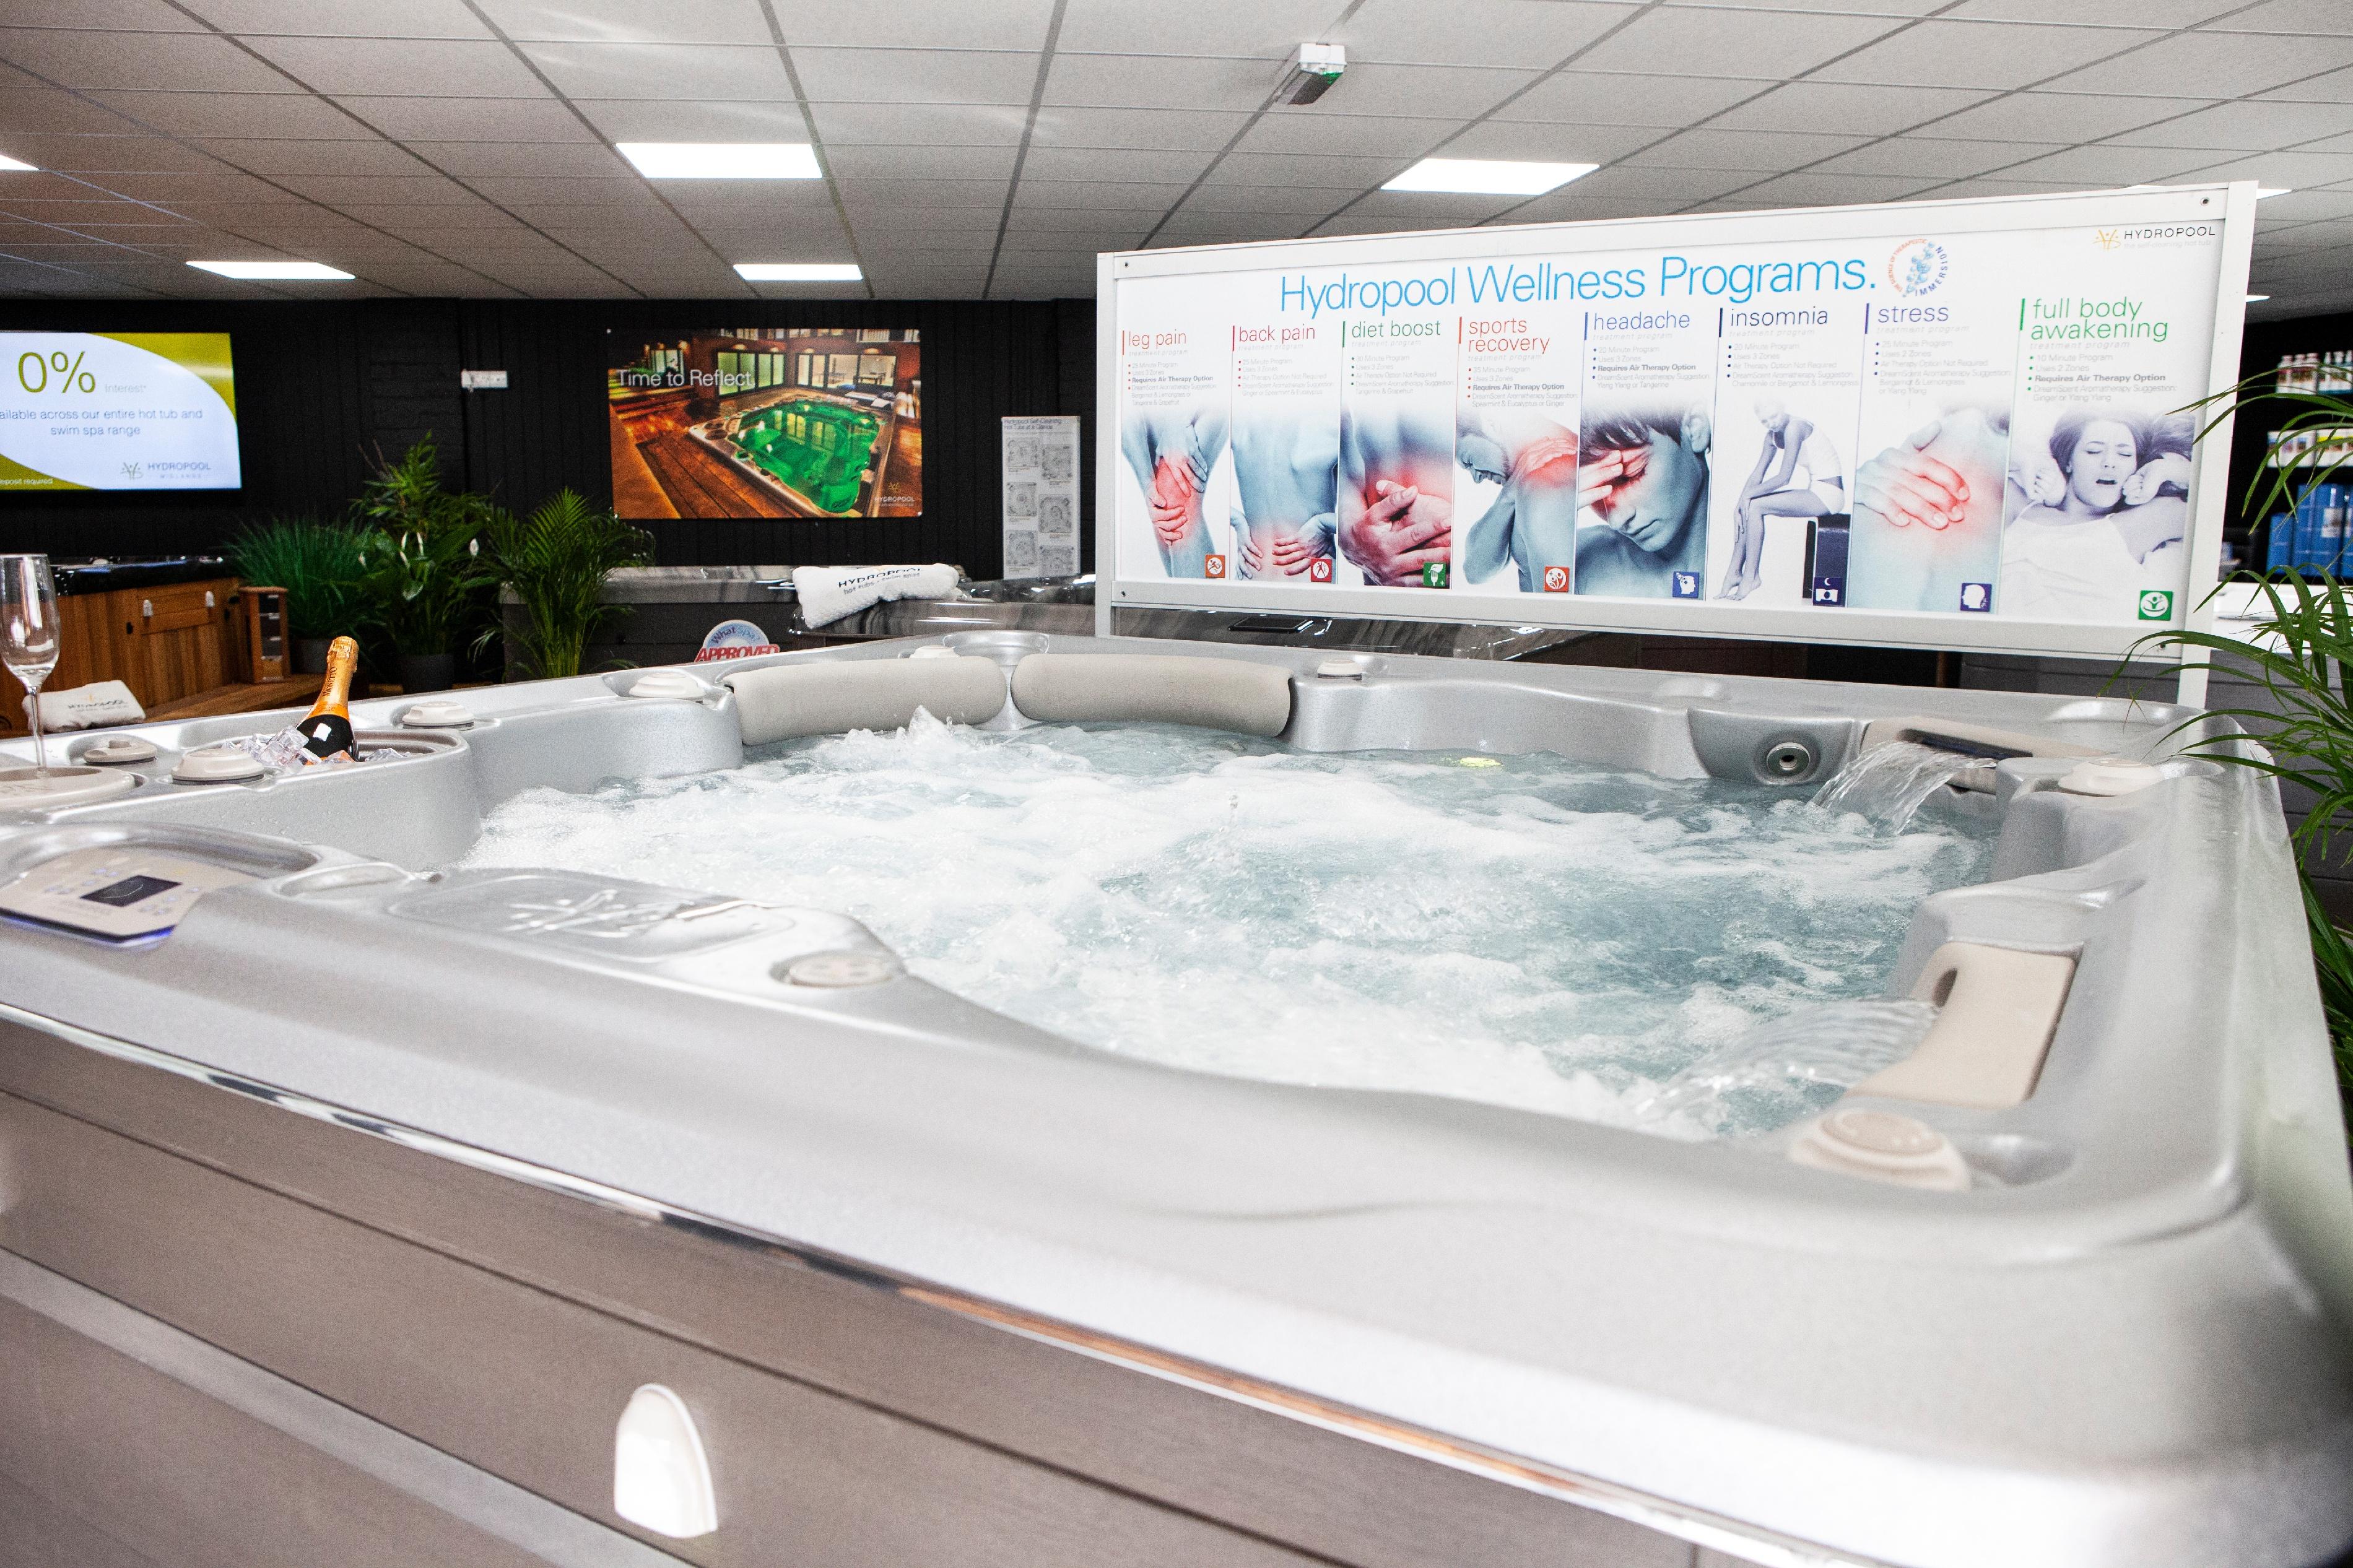 Hydropool_Midlands_Showroom_Hot_Tub_Nottingham_001-1